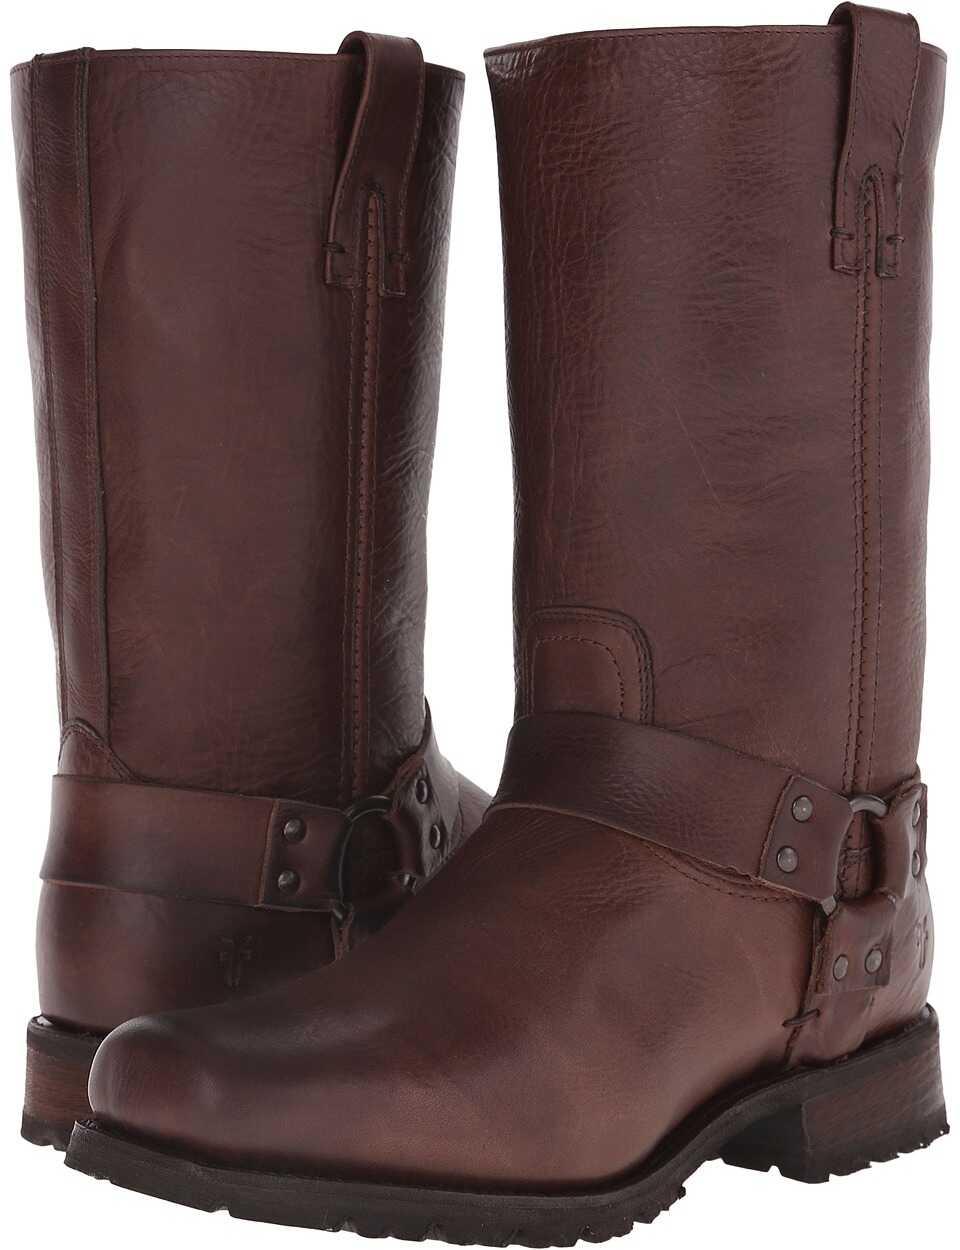 Frye Heath Studded Harness Dark Brown Vintage Leather